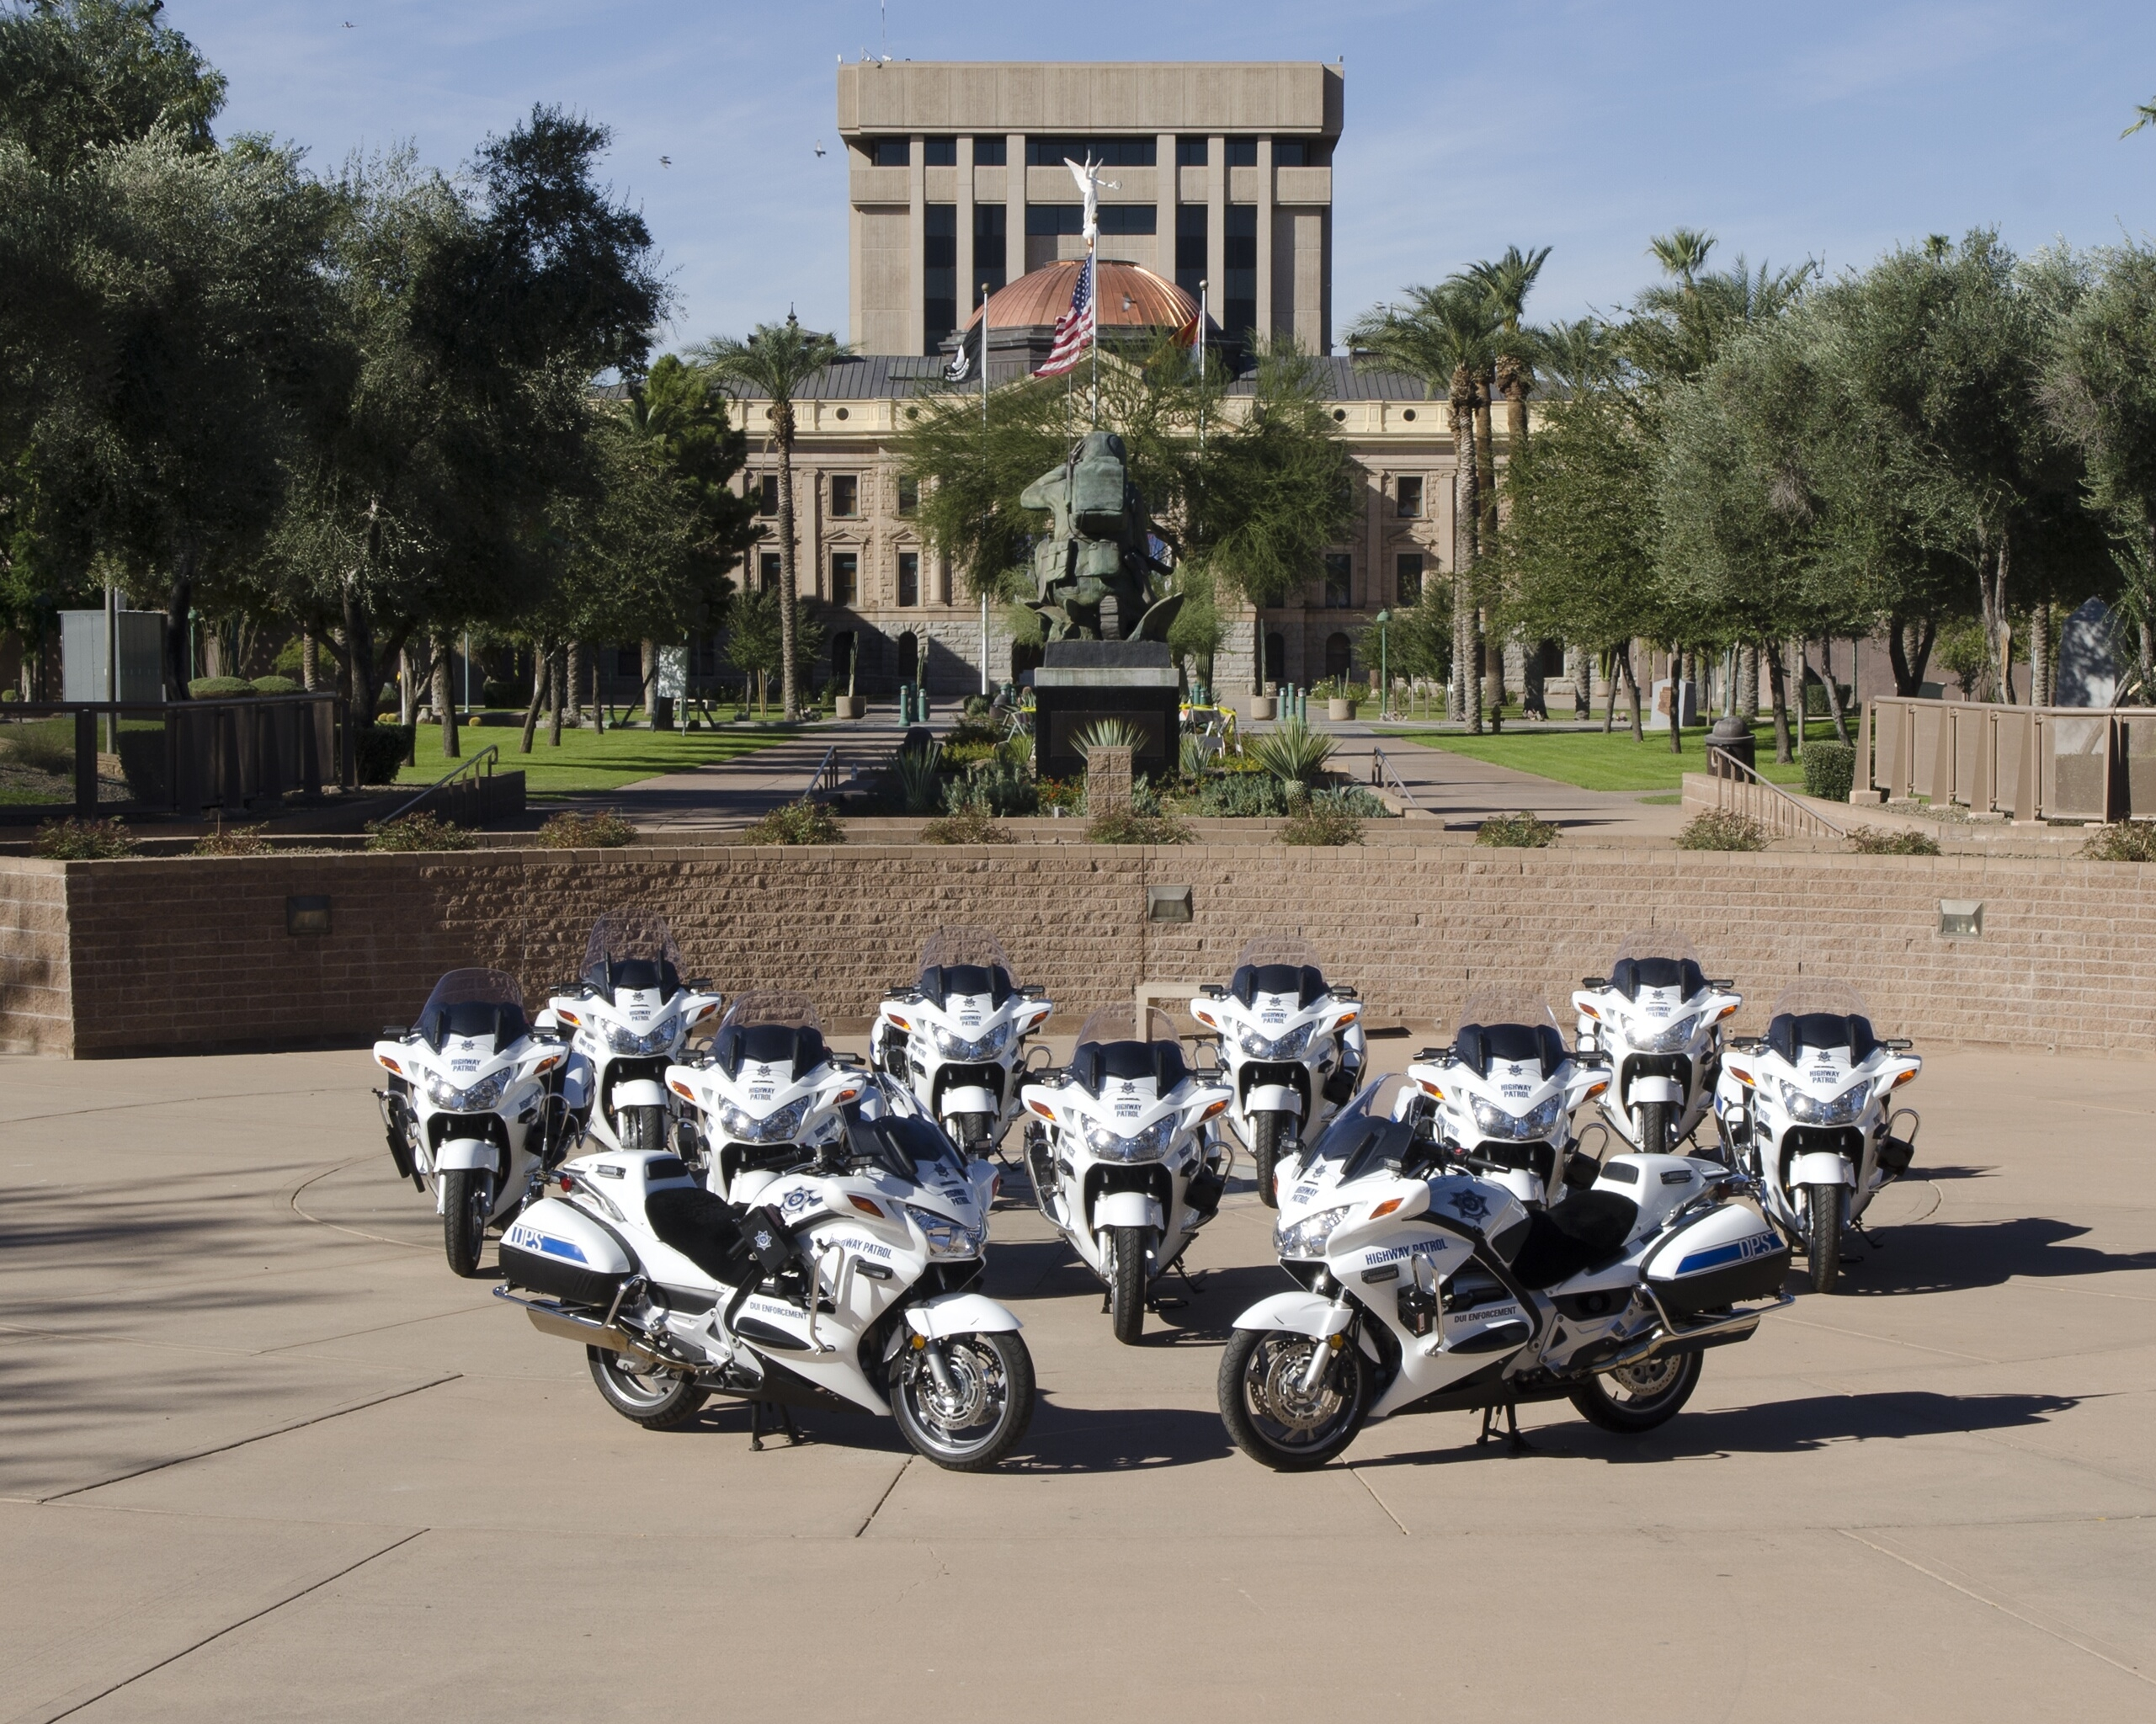 Tucson Arizona Motor Vehicle Department State Of Arizona